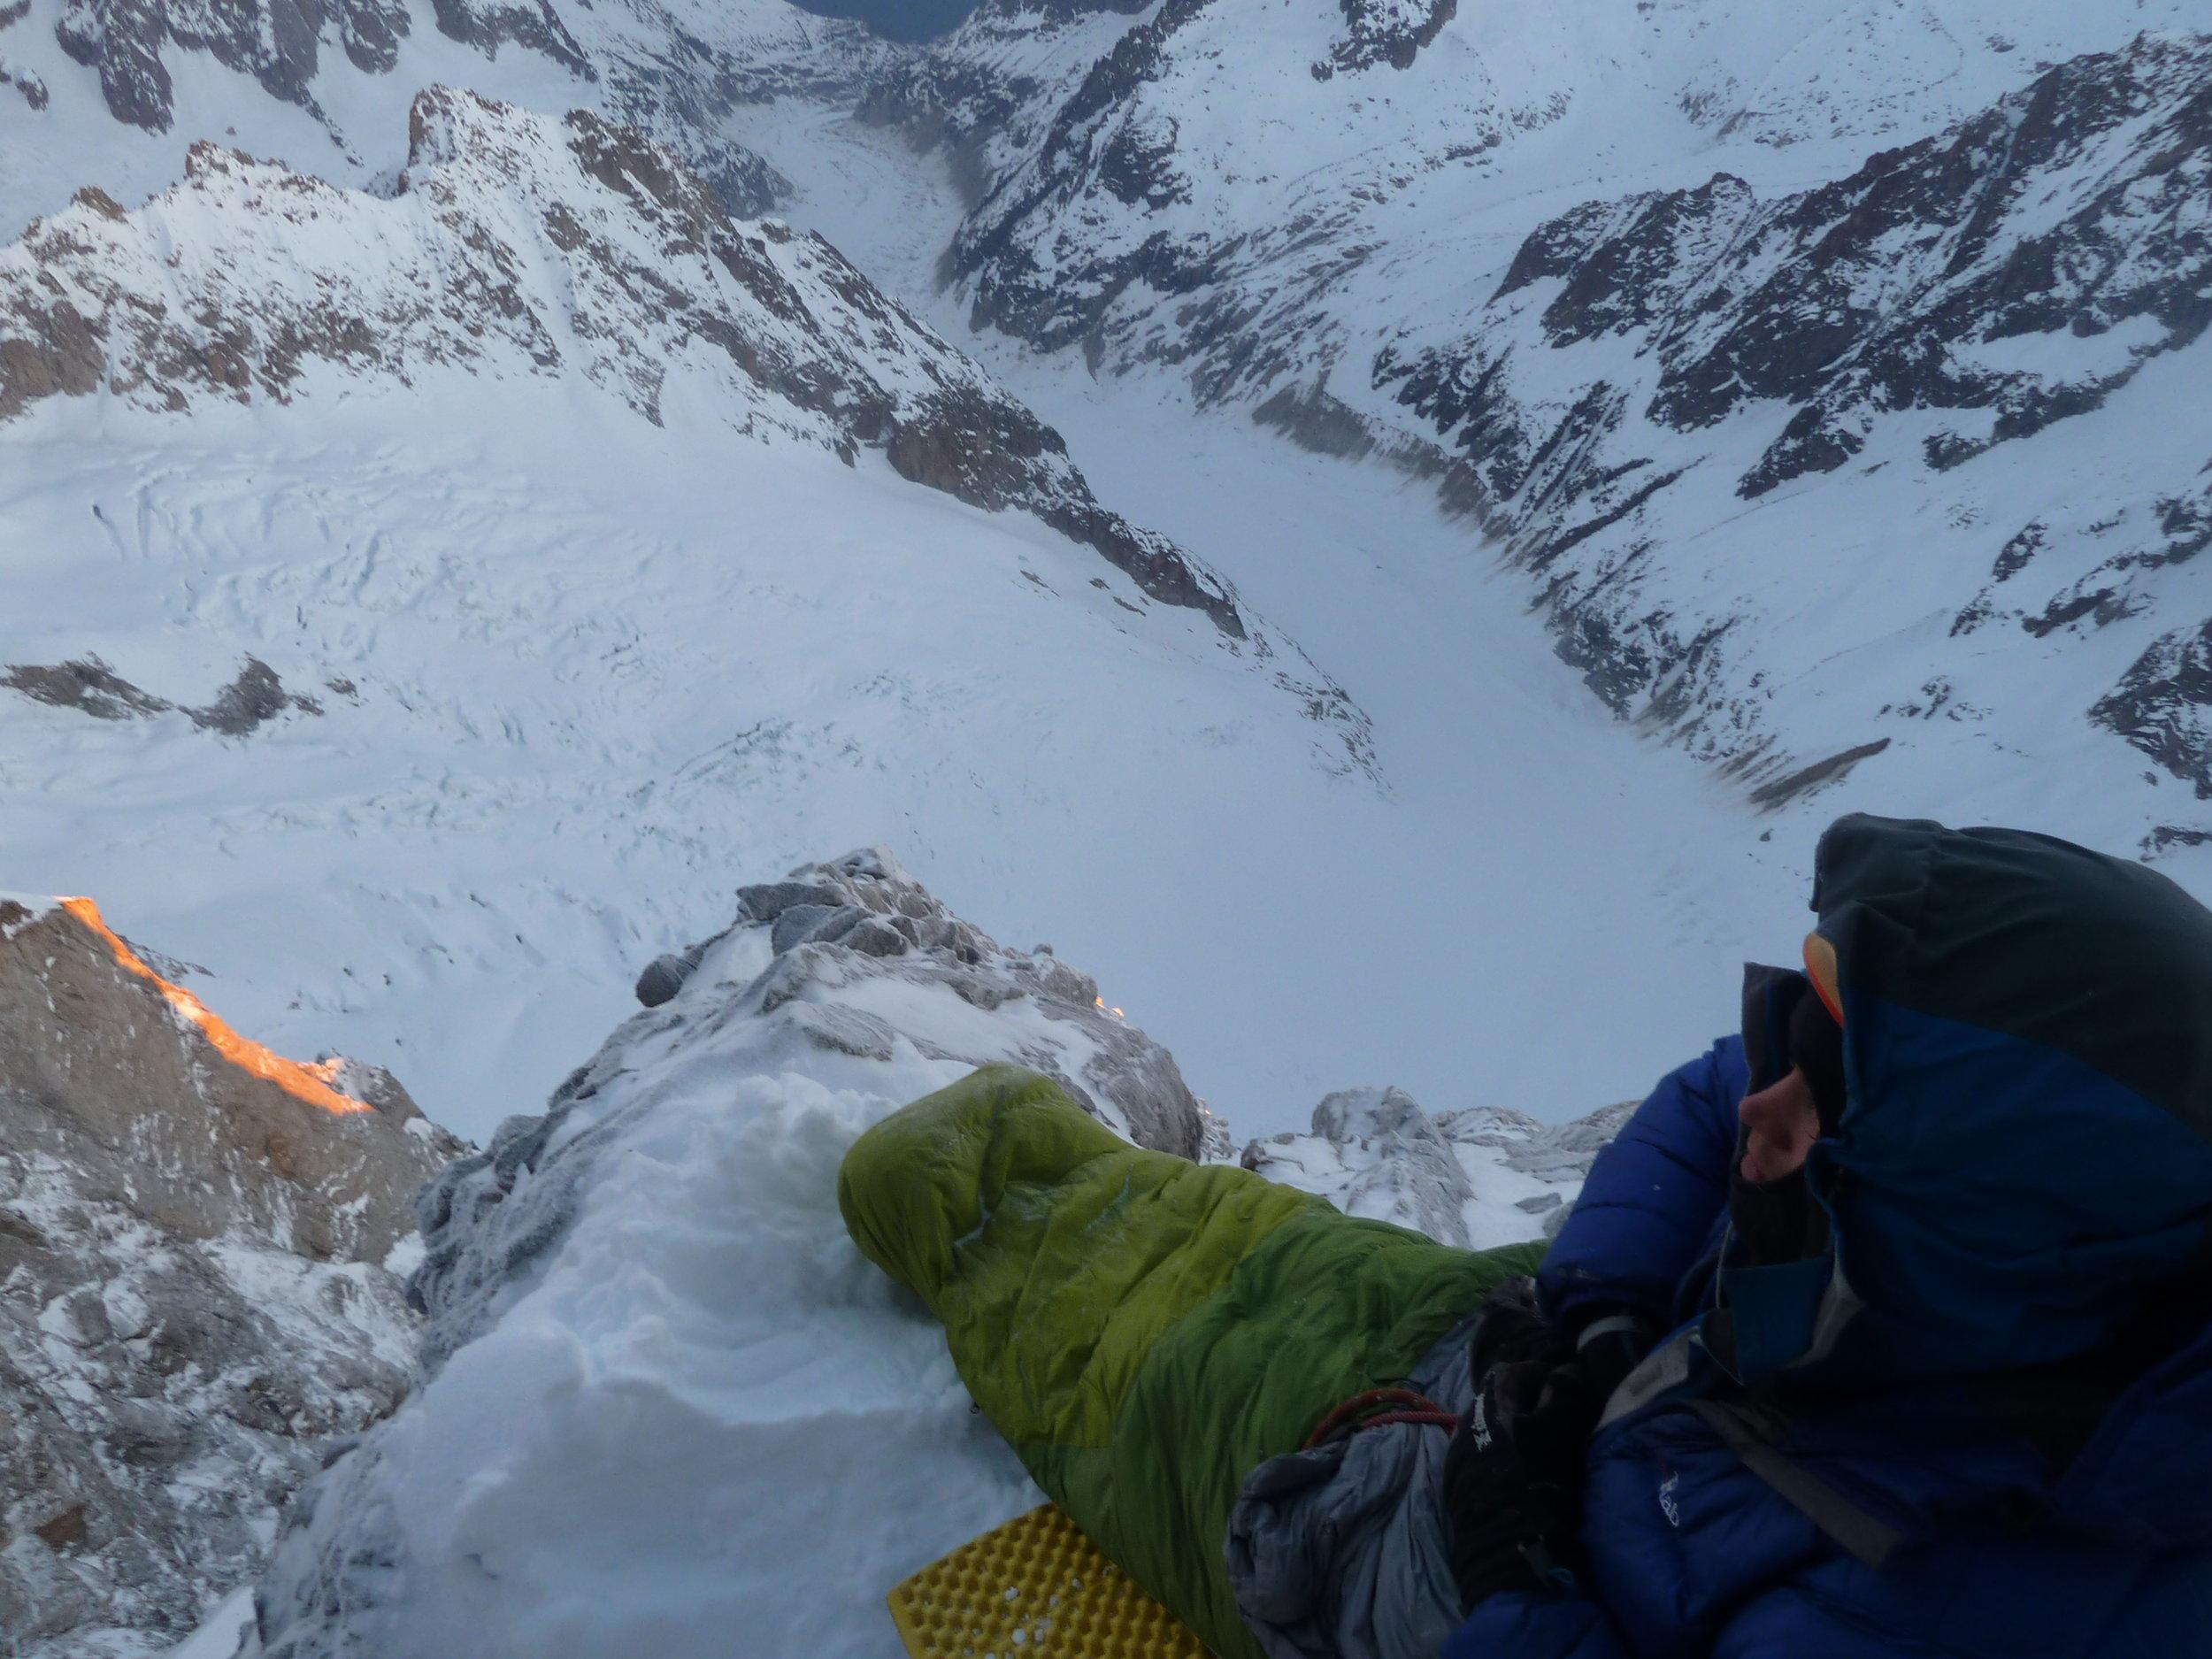 walker spur, winter ascent, grandes jorasses, mont blanc massif. Chamonix.